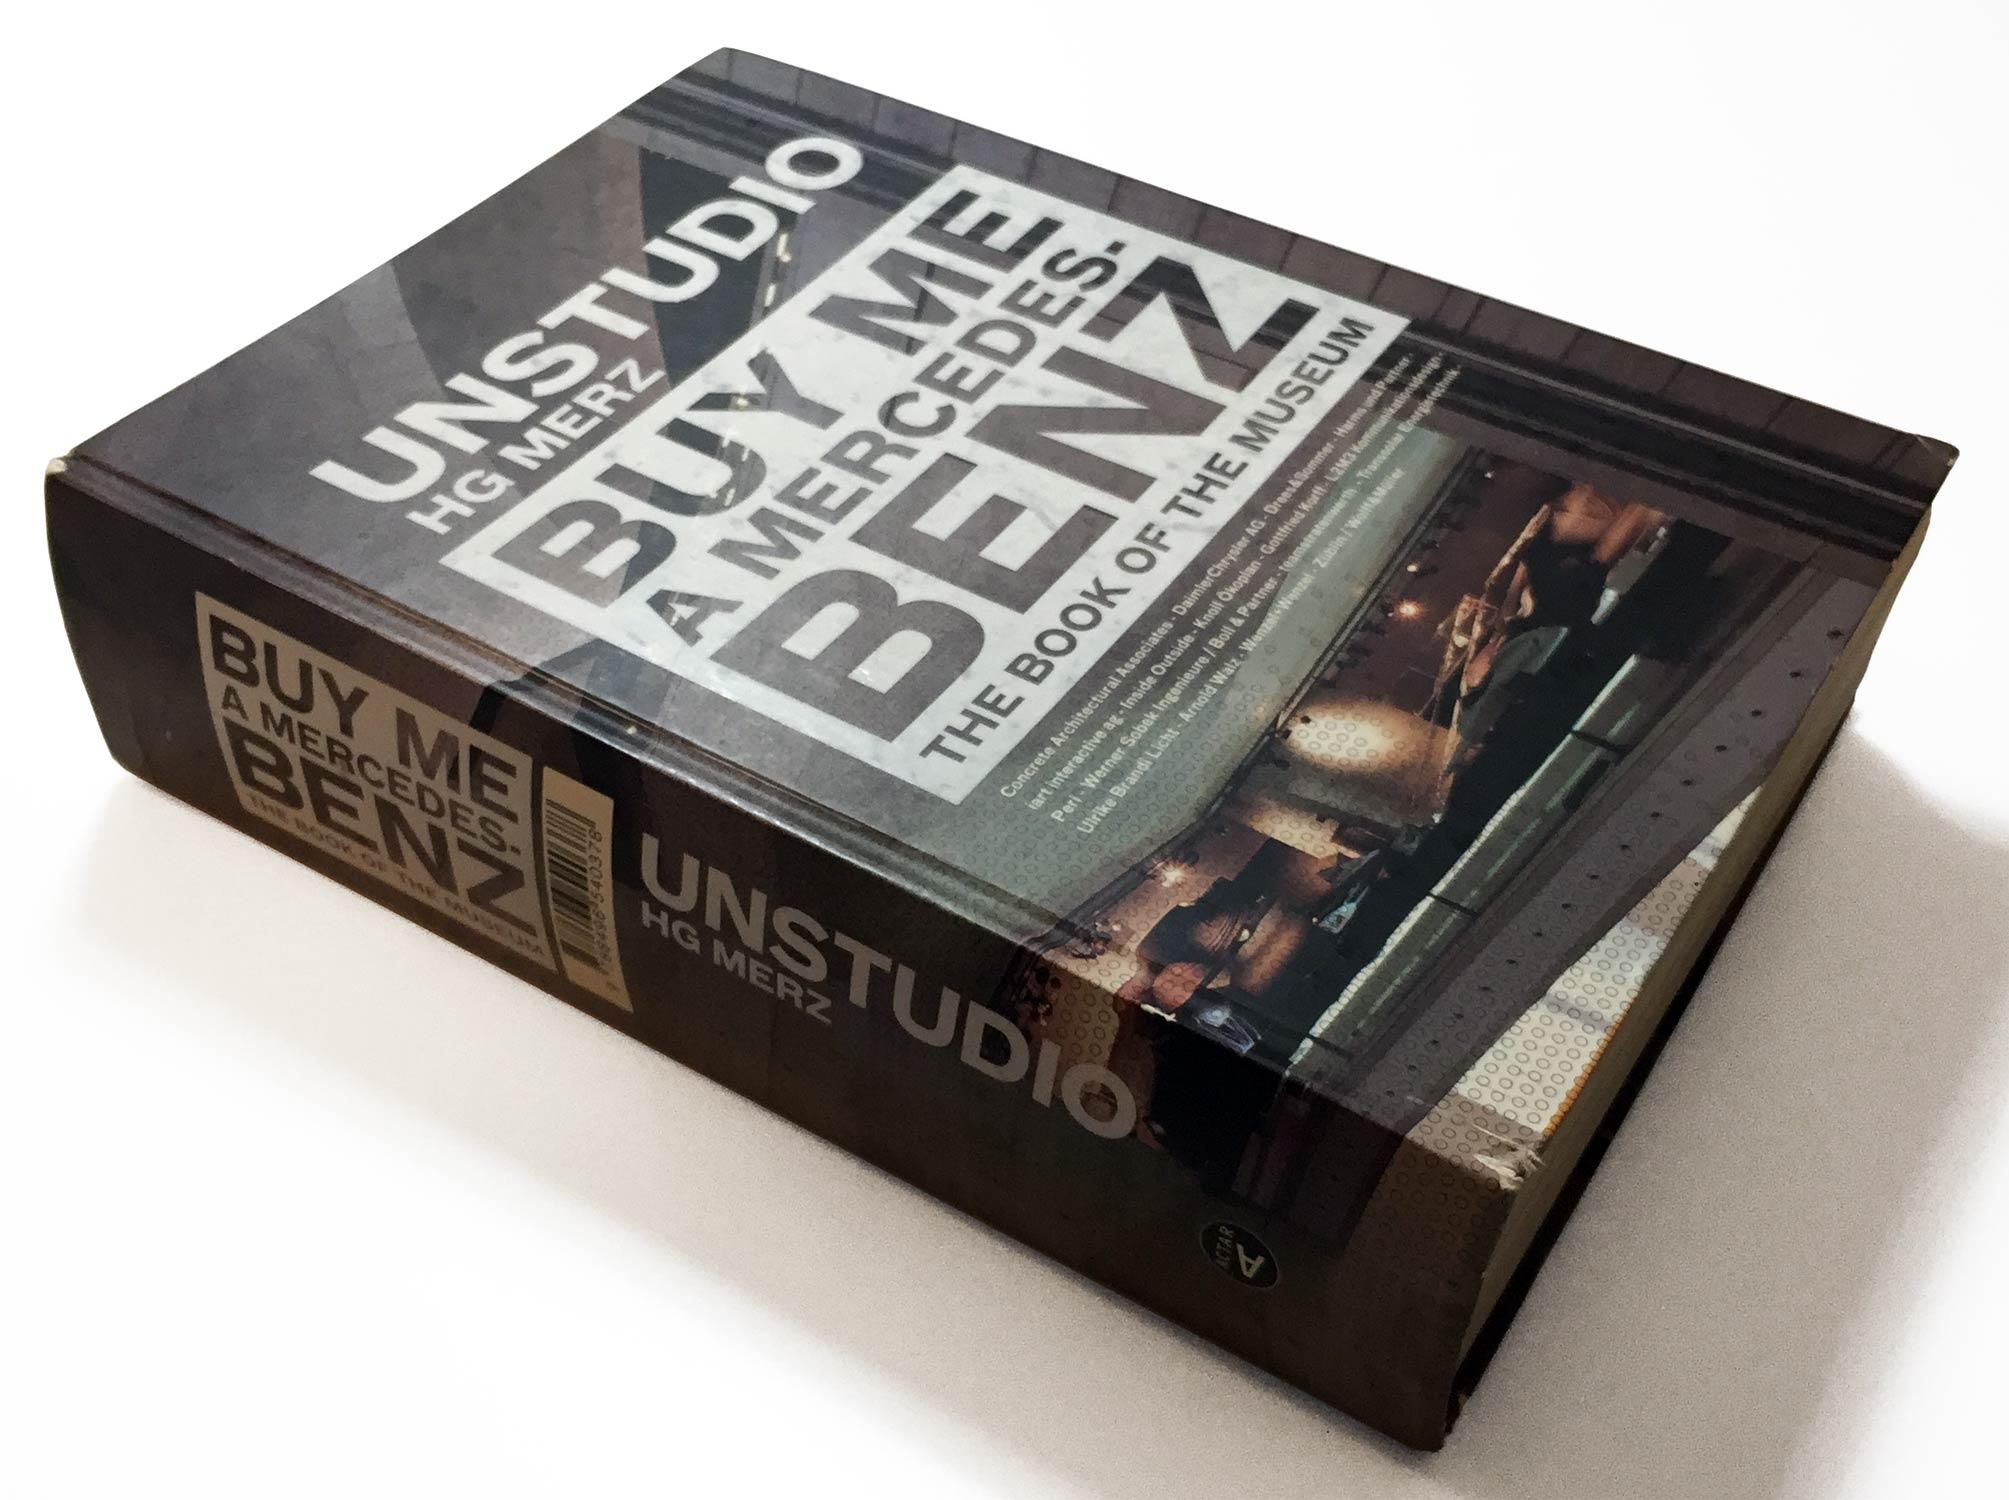 UN Studio : BUY ME A MERCEDES-BENZ The Book of the Museum[image5]